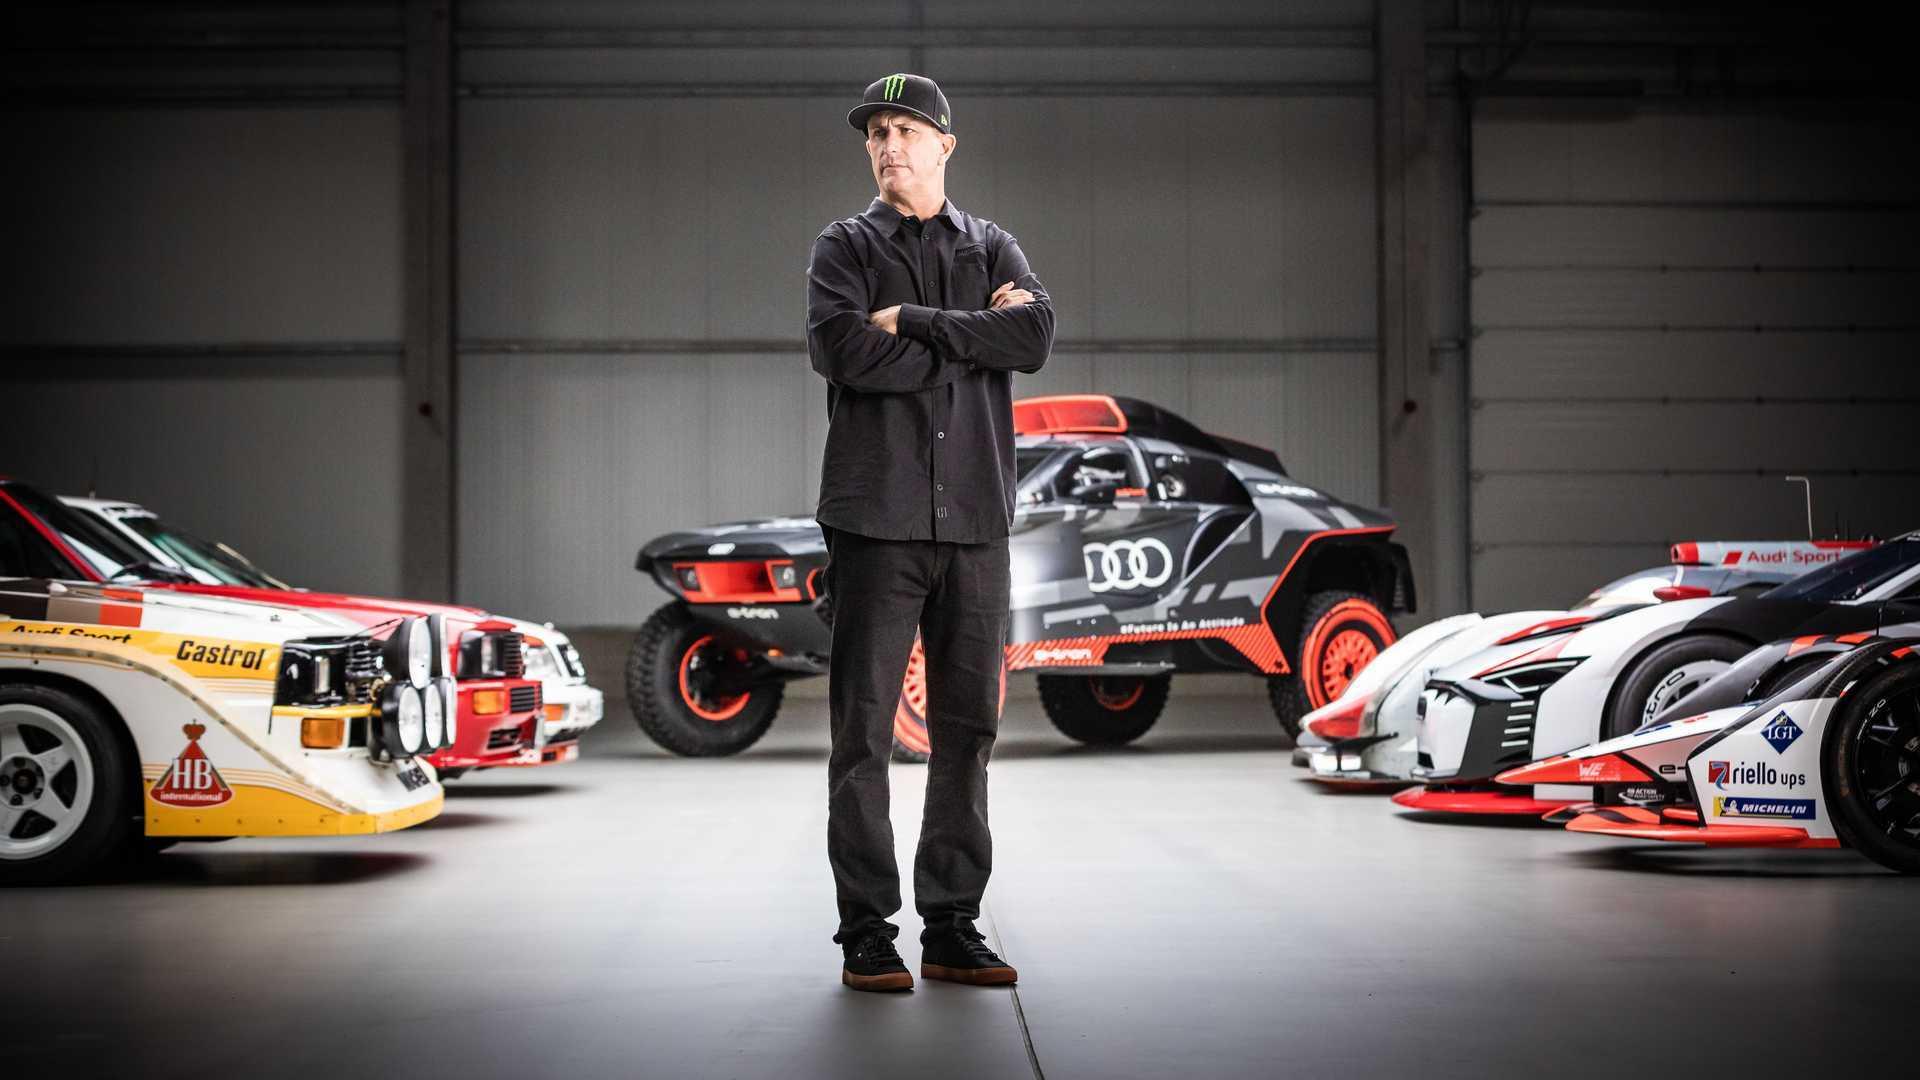 Ken Block Partnership With Audi With Cars